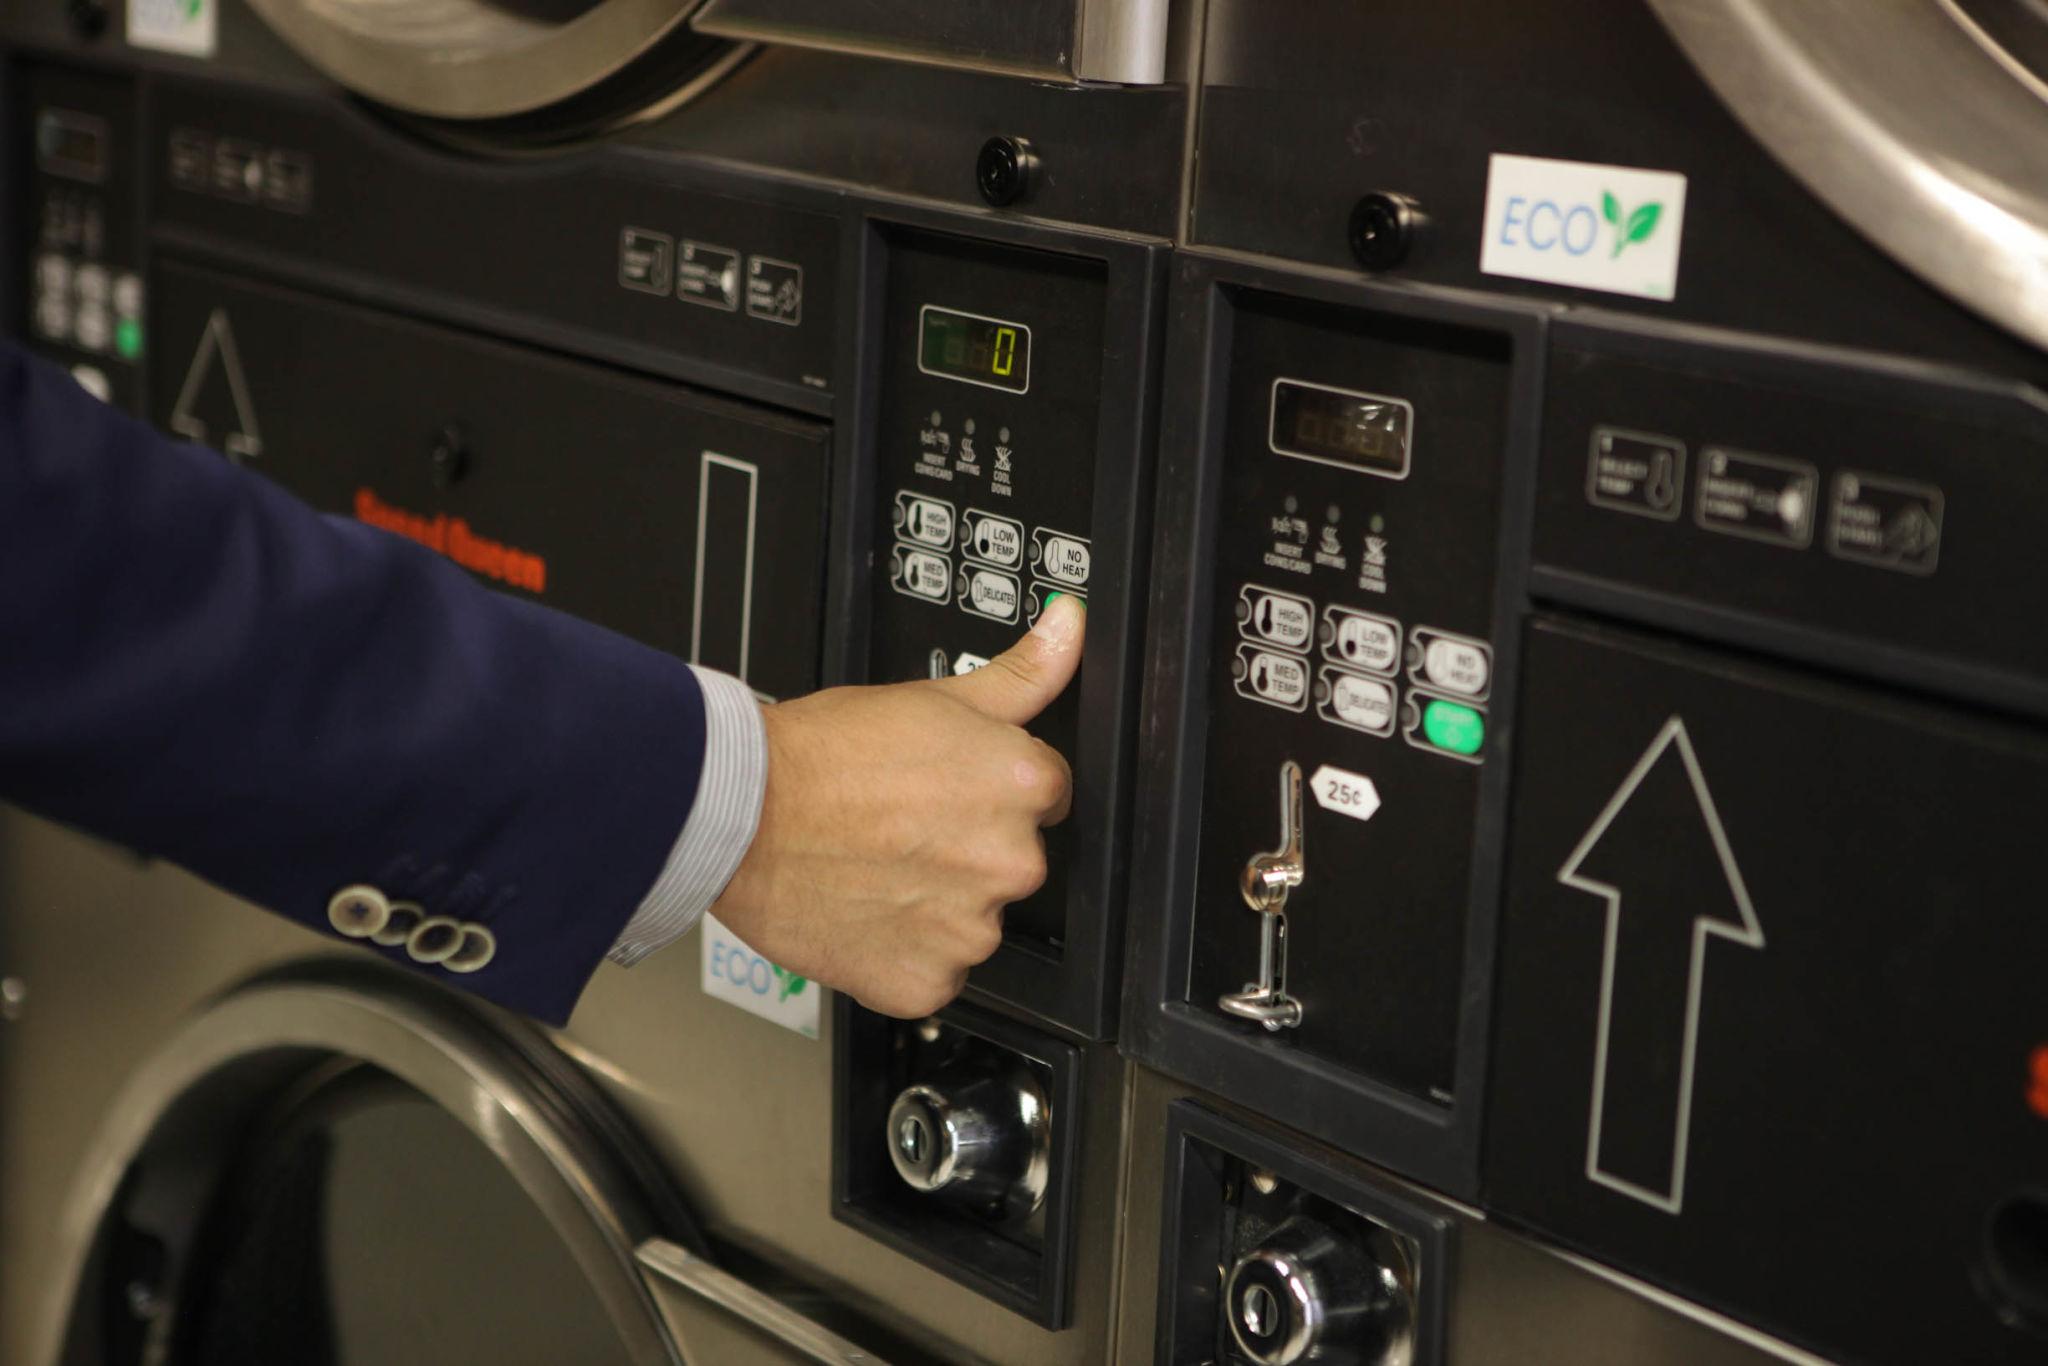 Testing Speed Queen washing machine Russia